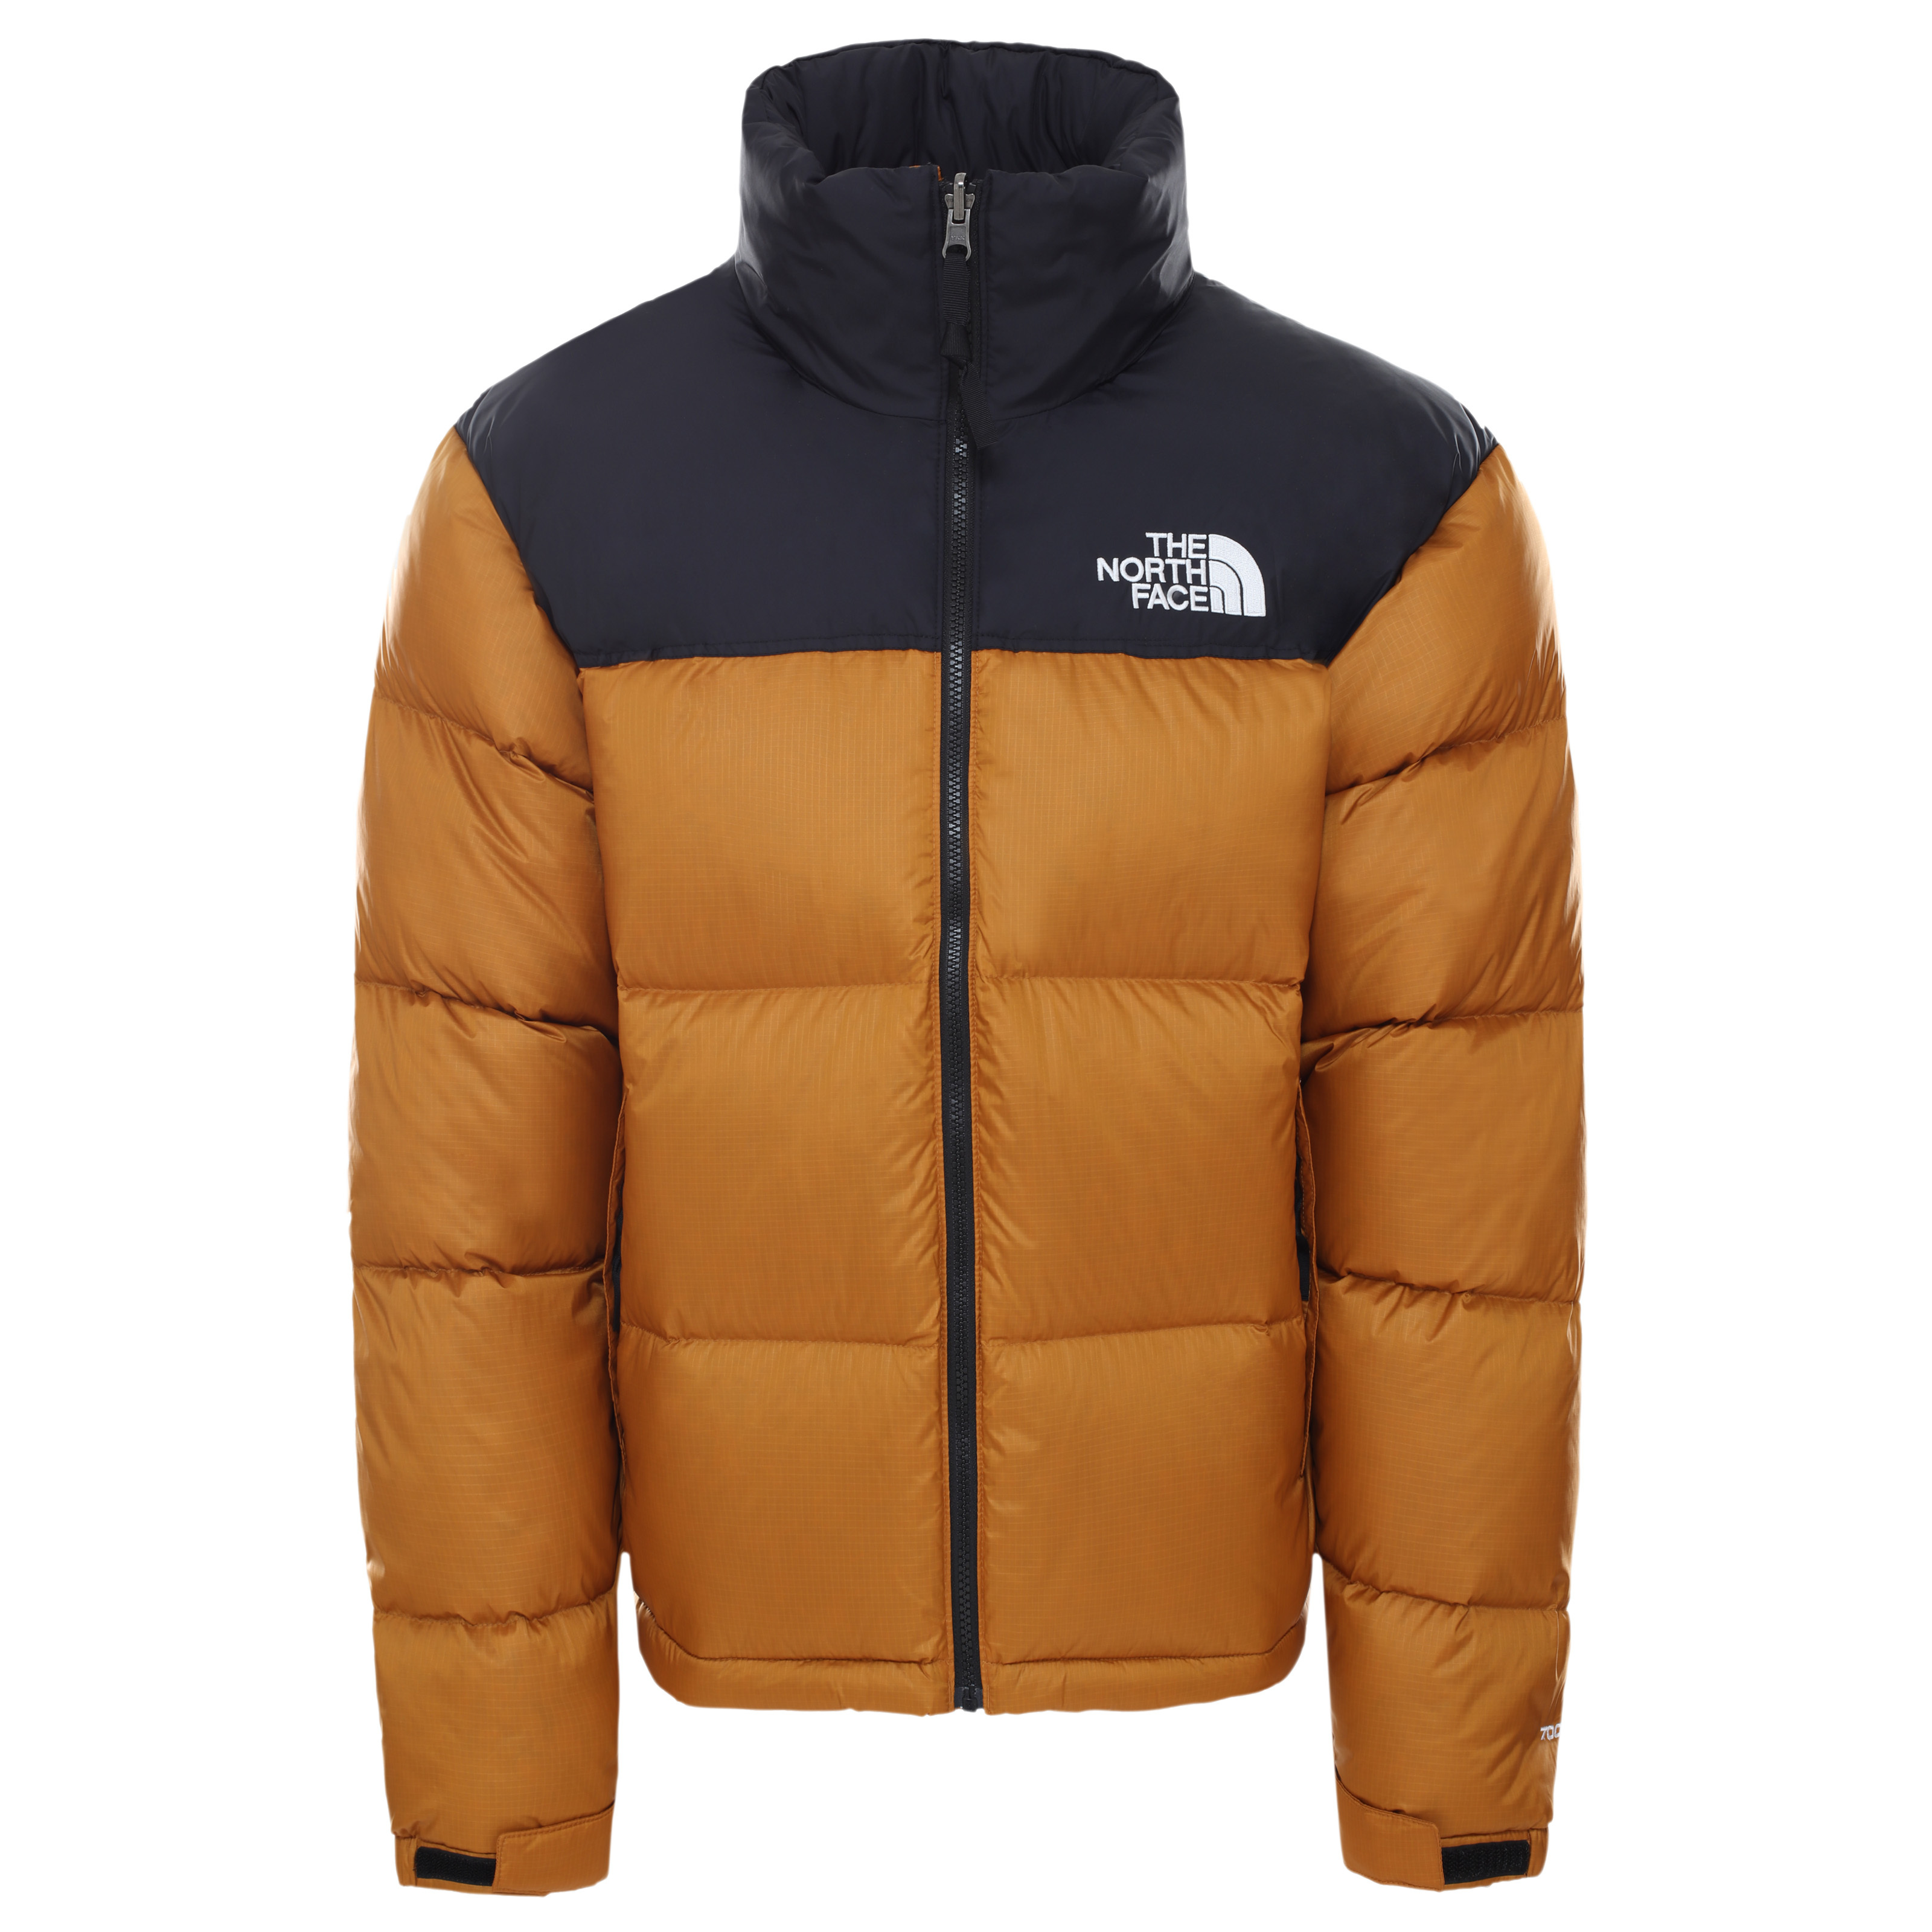 Geci The North Face 1996 Retro Nuptse Jacket Timber Tan